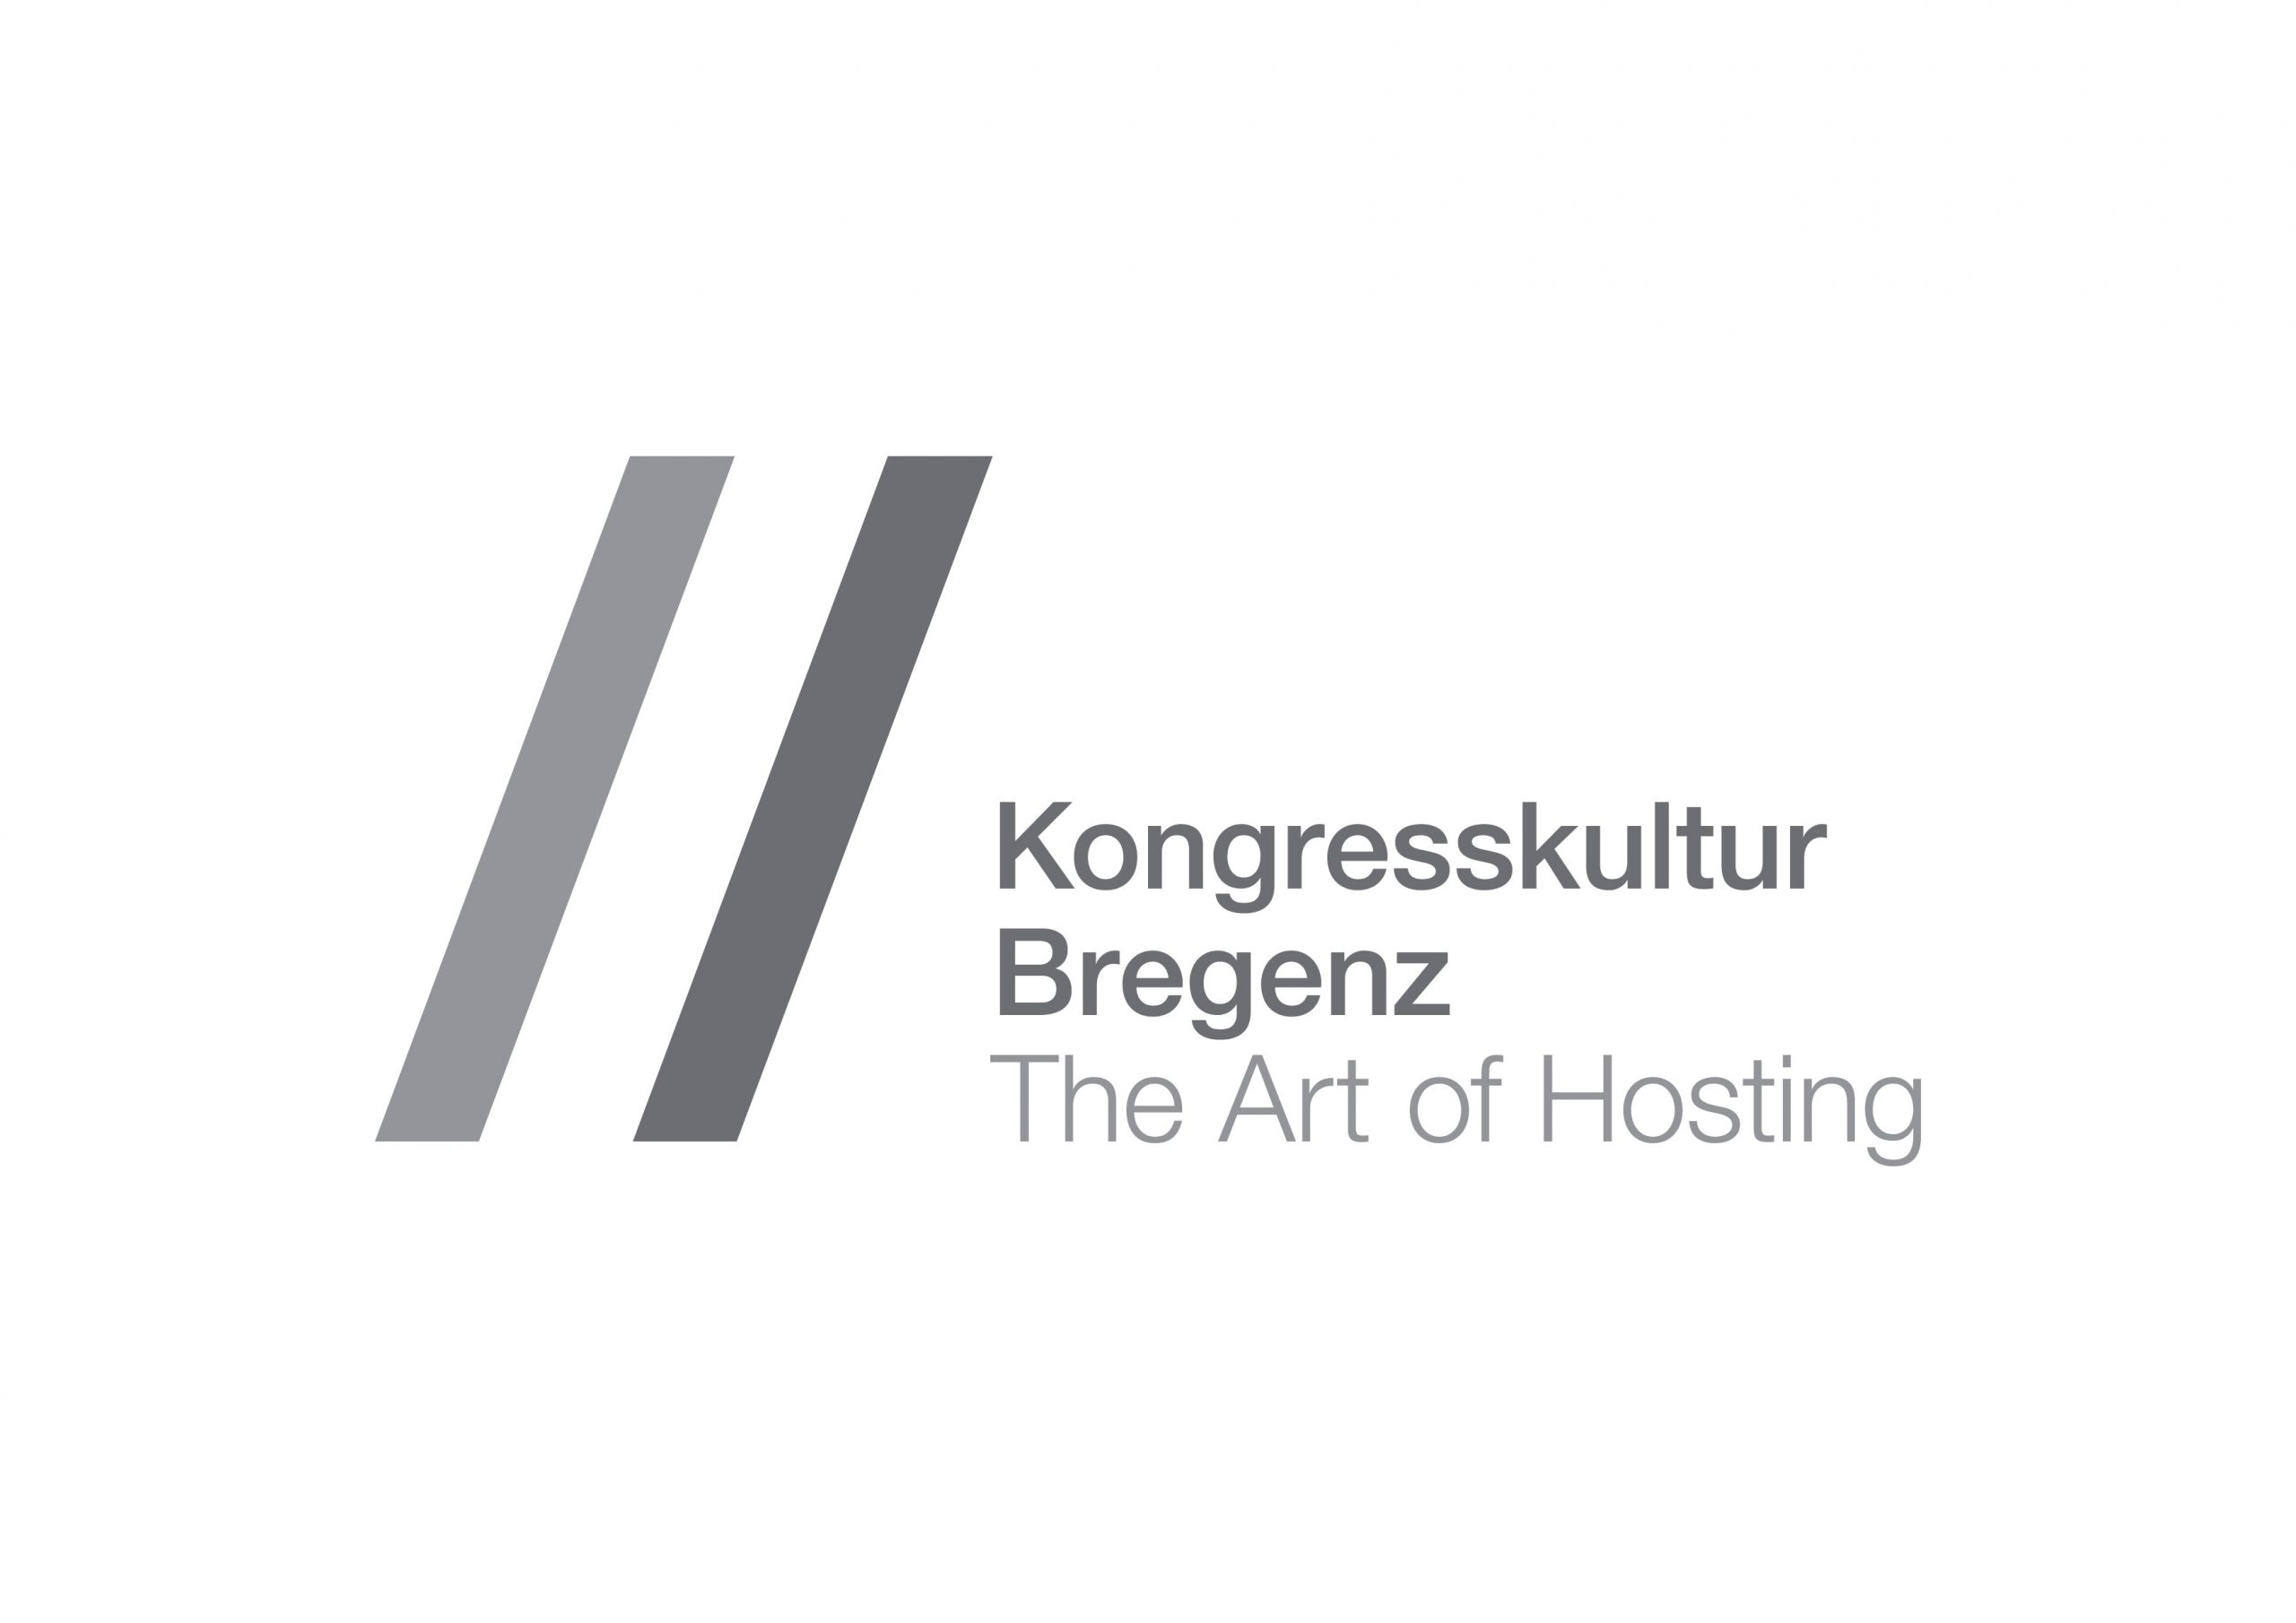 Kongresskultur Bregenz Logo